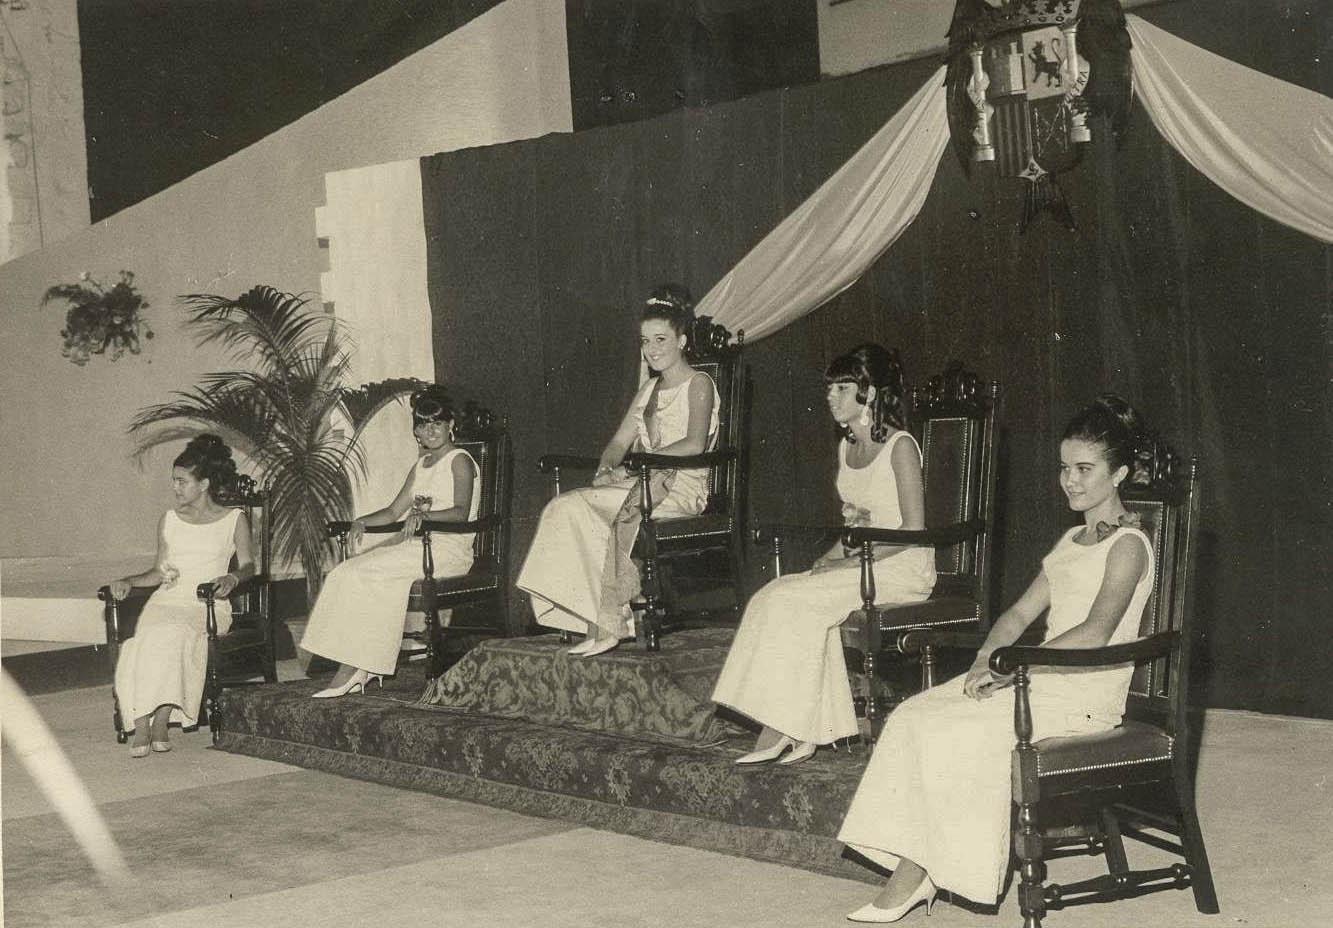 Fiestas de Julio de 1967 - Reina Candelaria Rodríguez Rodriguez